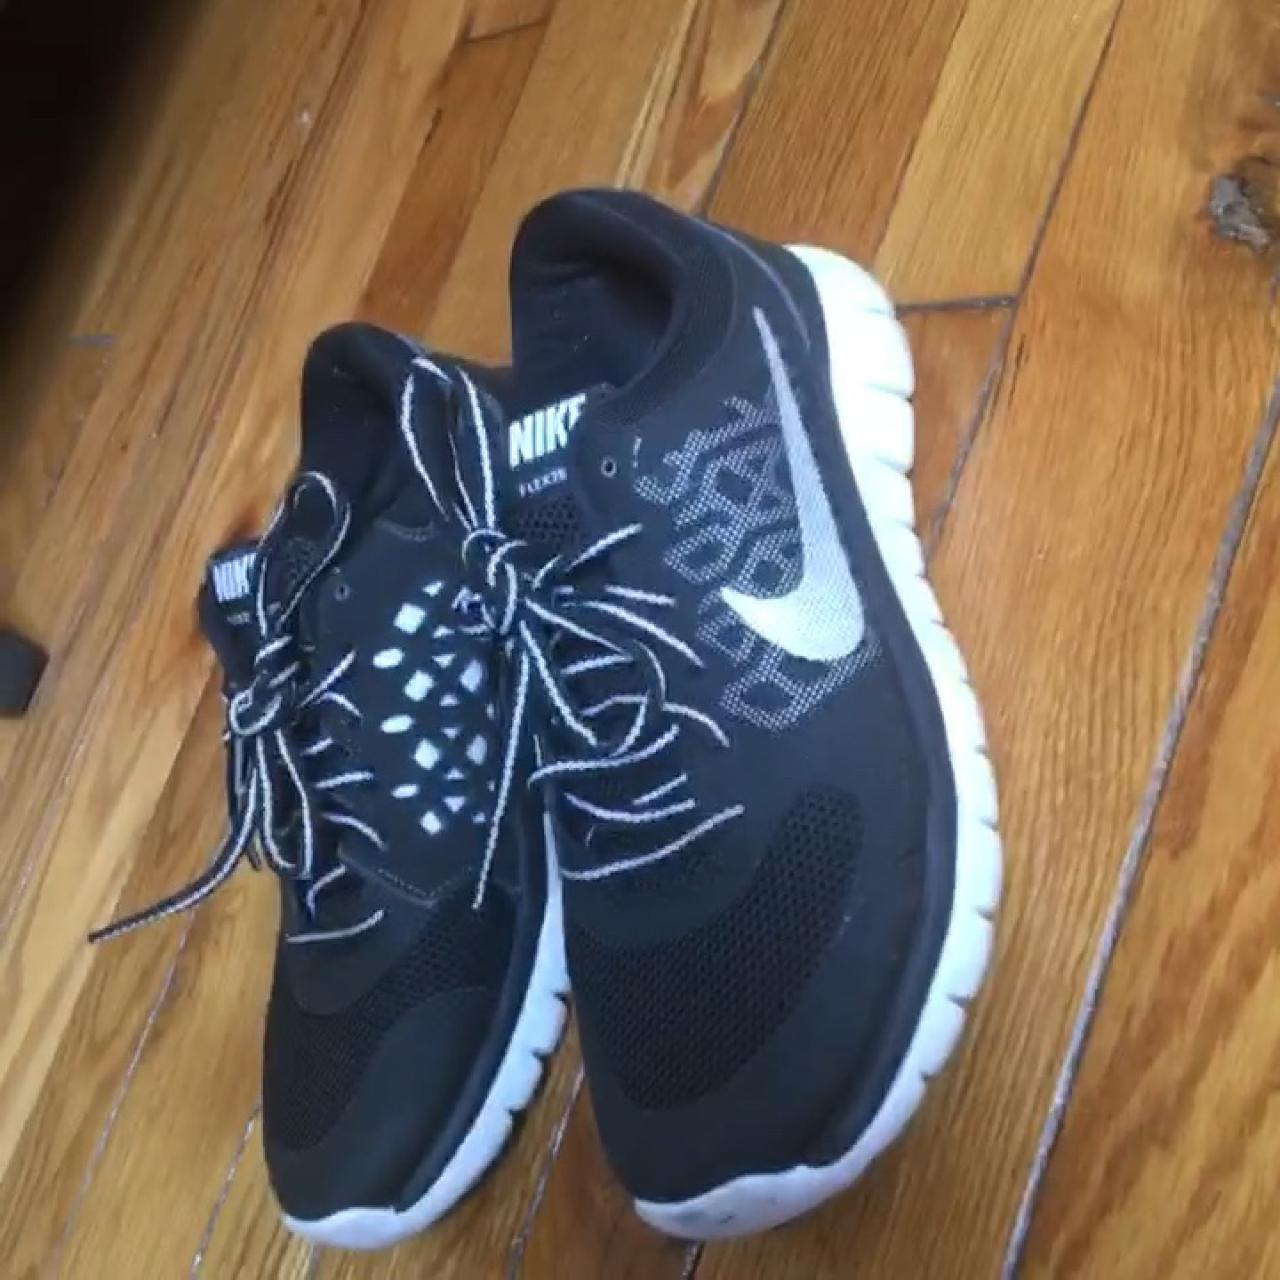 9e46f47374e8c Nike flex sneakers kids size 5y same as womens 7